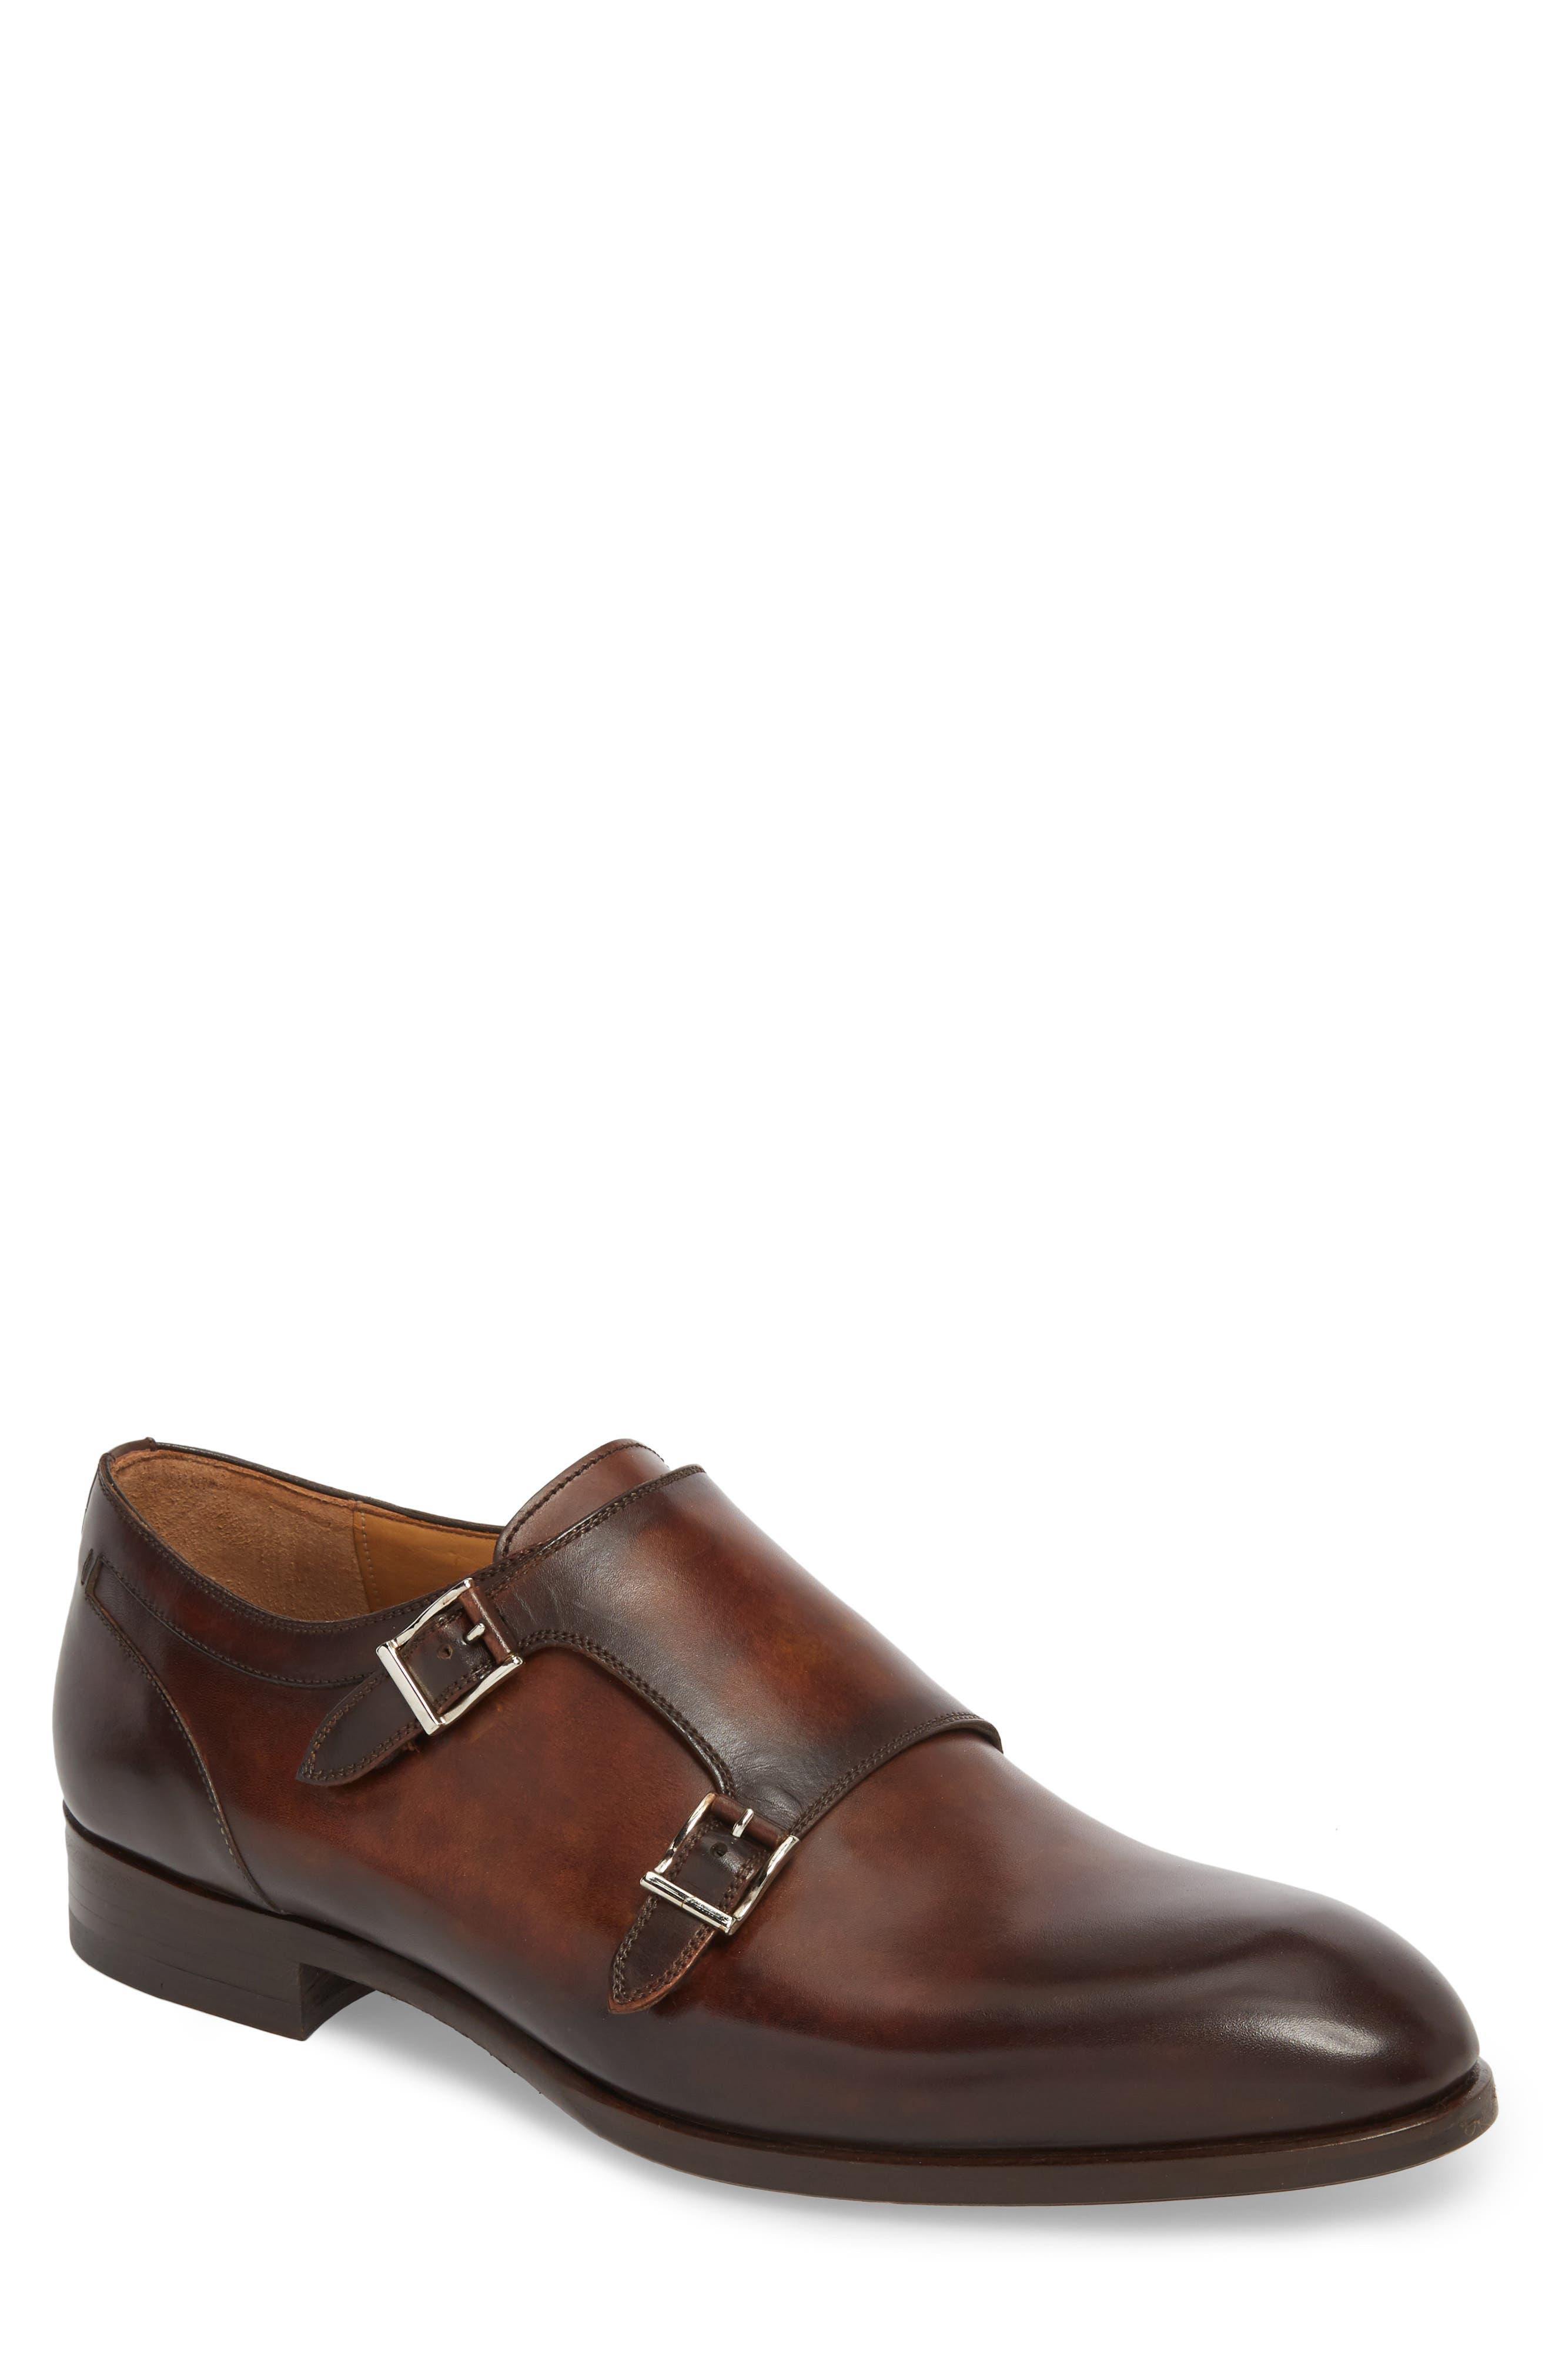 Pratt Double Strap Monk Shoe,                         Main,                         color, Tabaco Leather